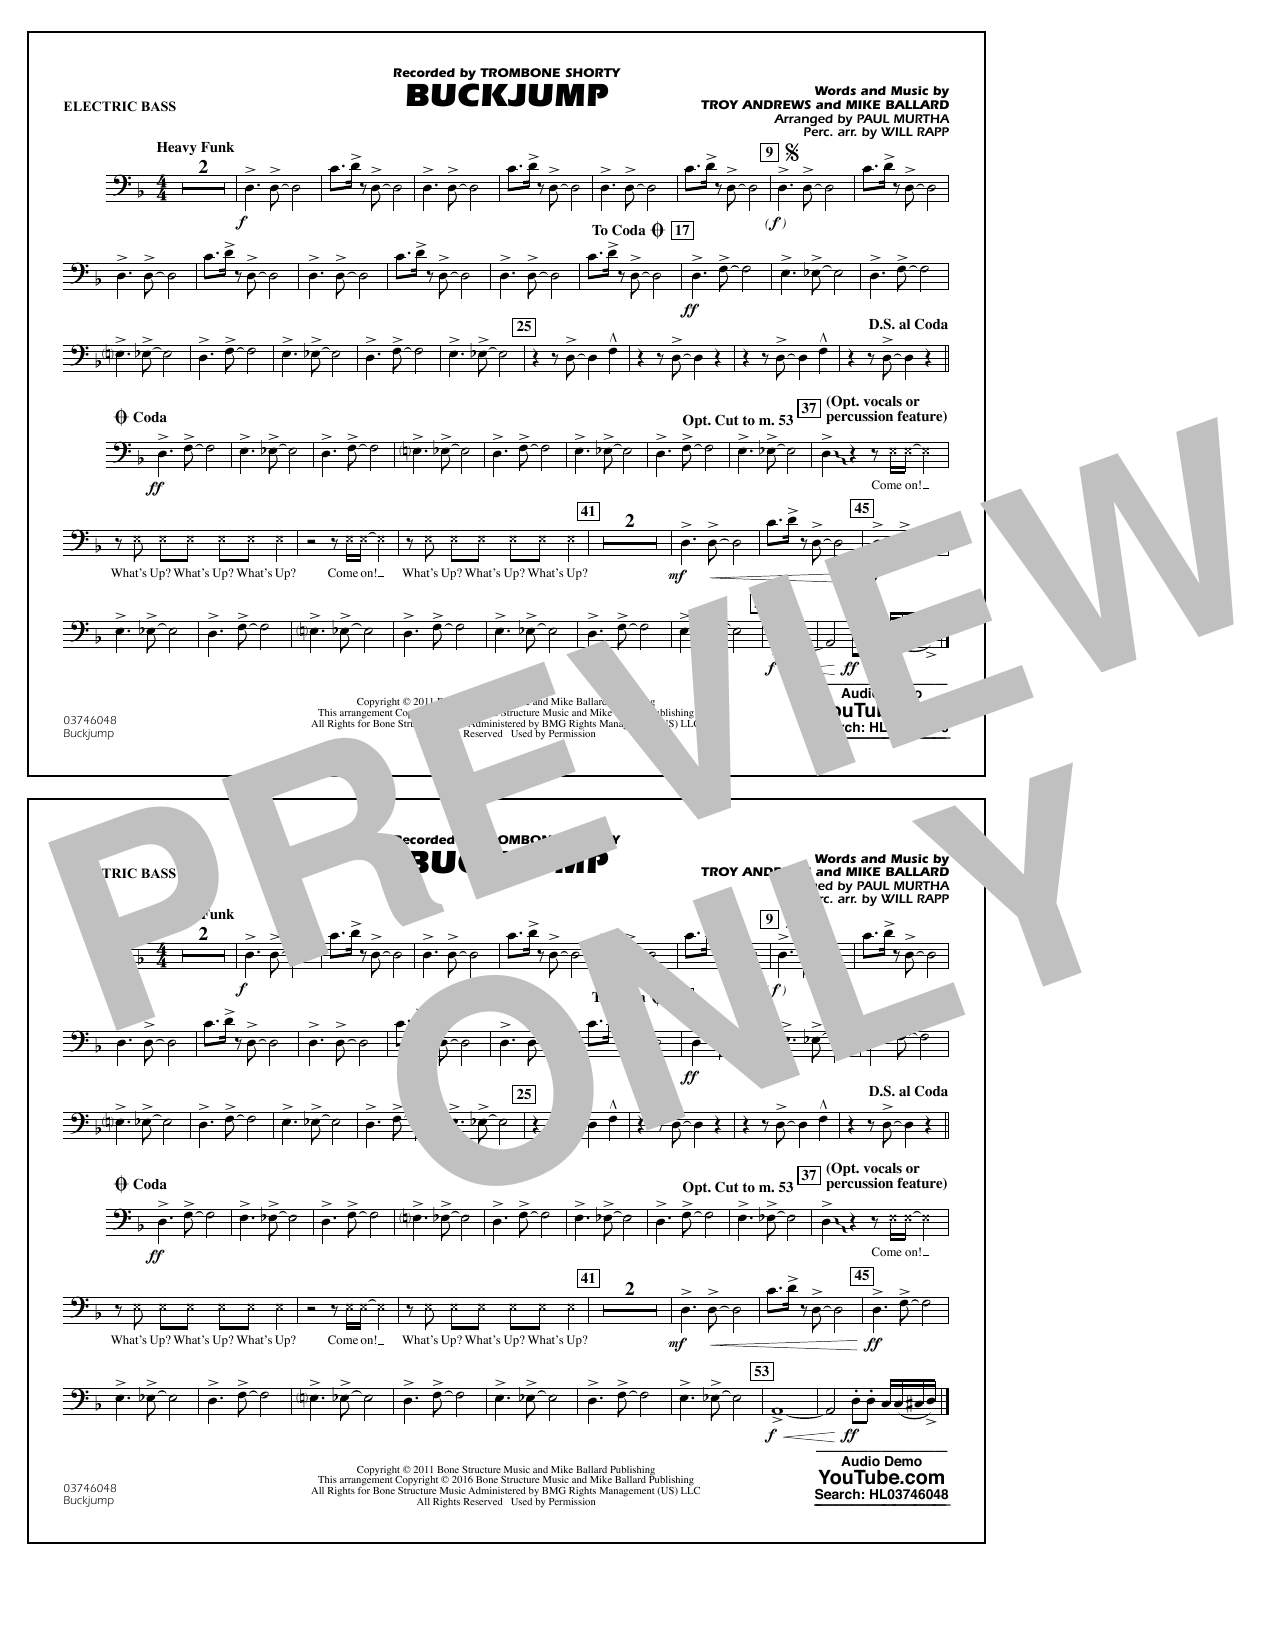 Buckjump - Electric Bass (Marching Band)